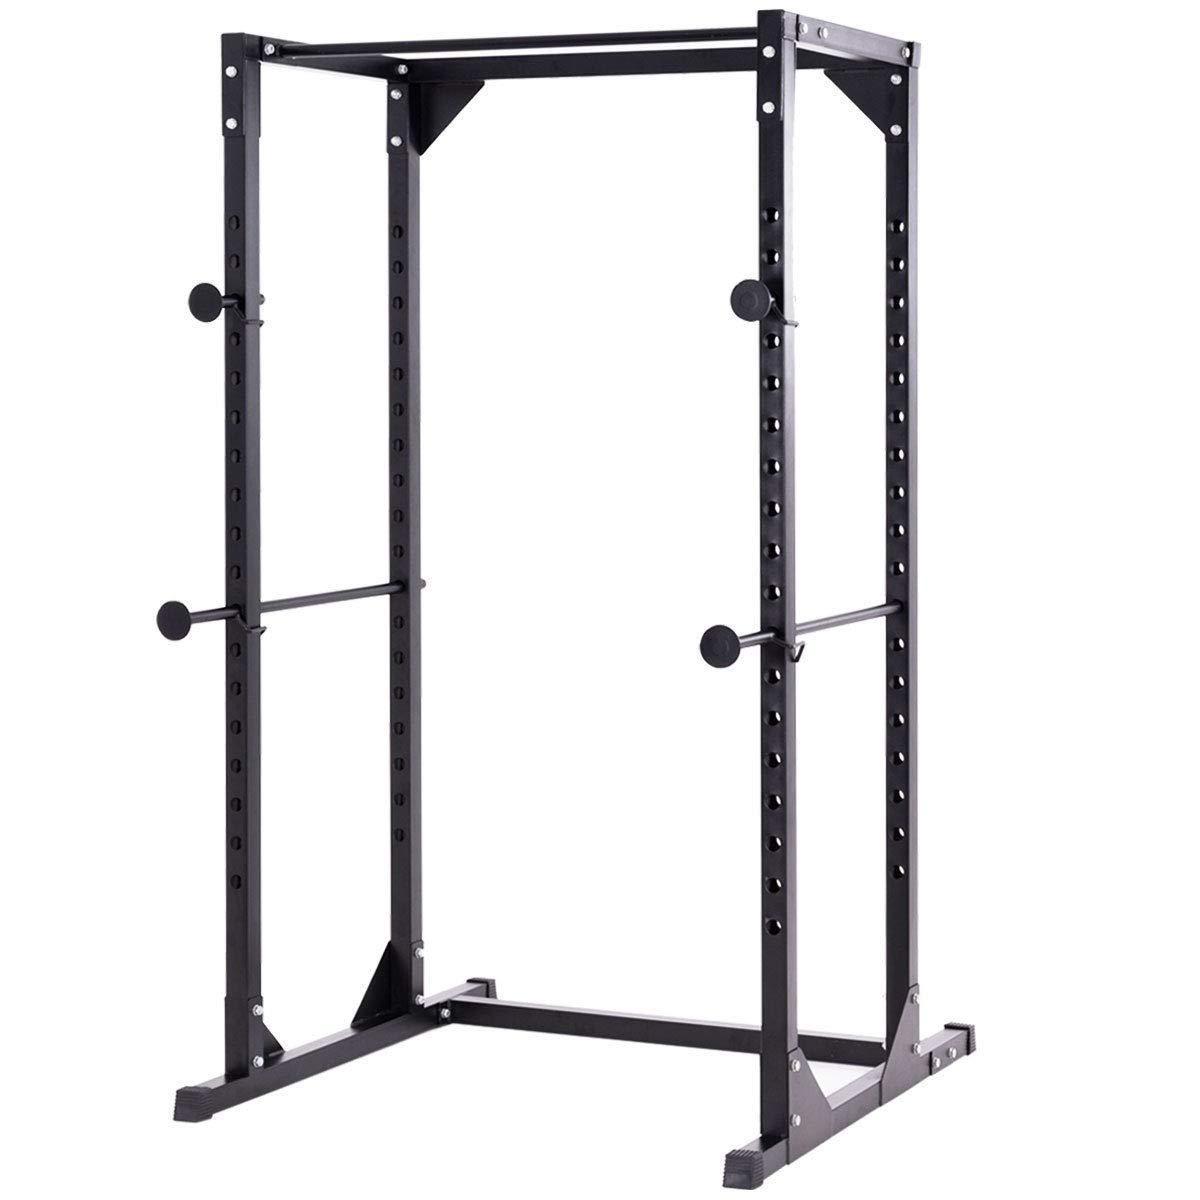 EnjoyShop → Chin up → Squat Stand → Strength → Training → Adjustable → Dumbbell Rack → Fitness → Gym → Black → Adjustable Height → Heavy Duty